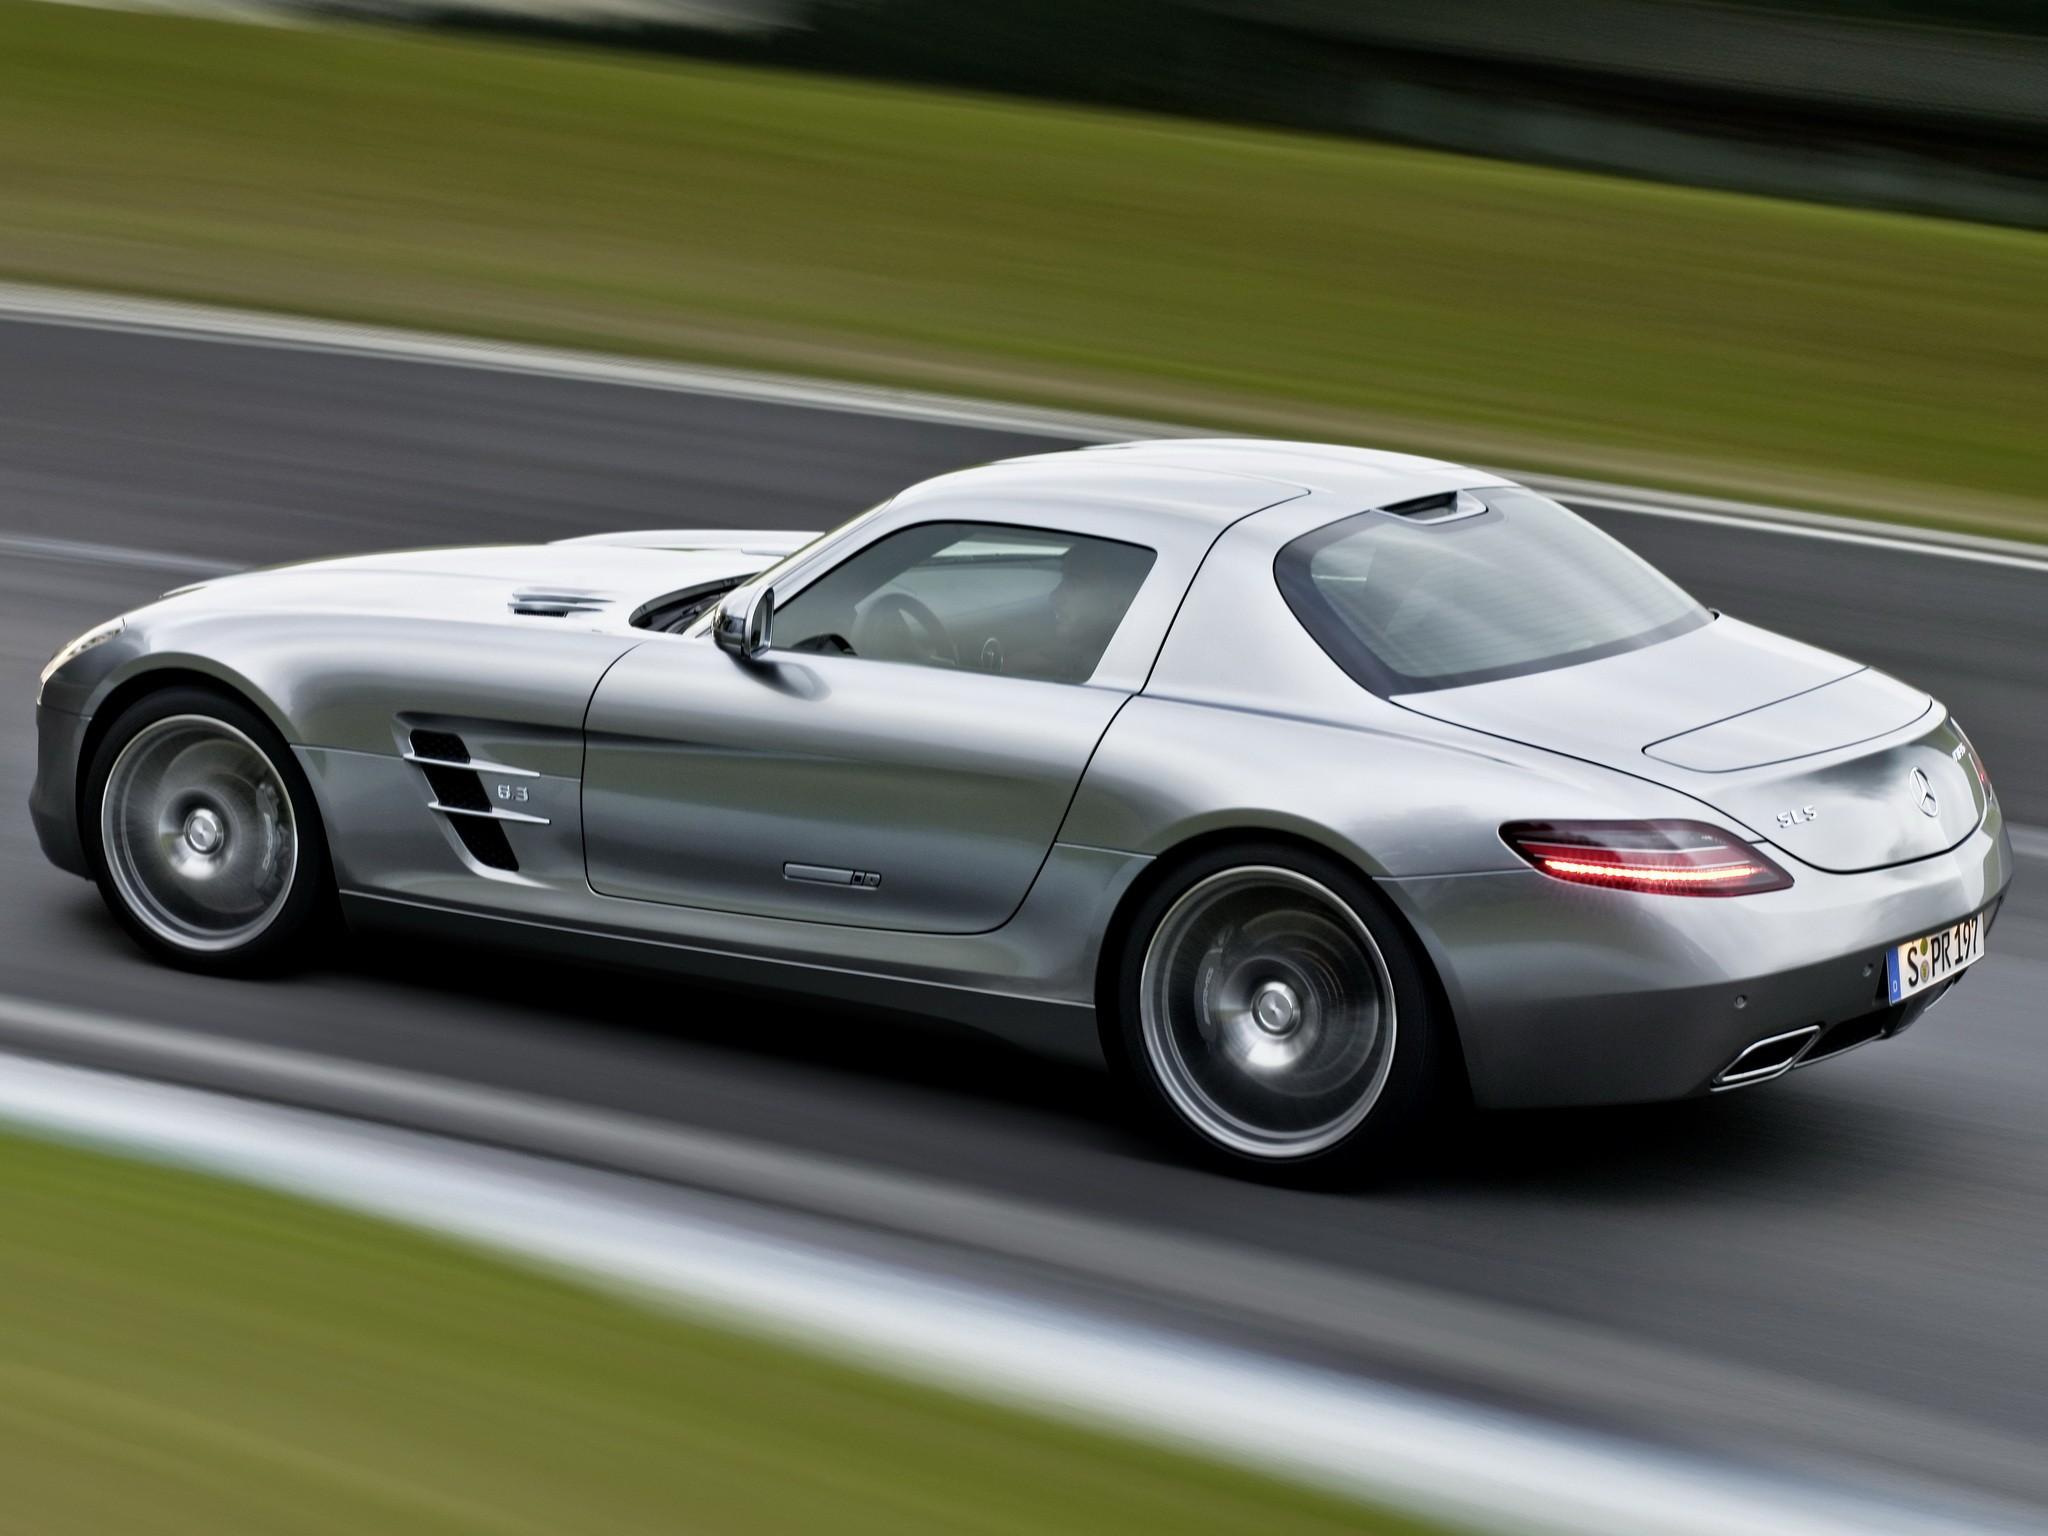 Mercedes benz sls amg engine mercedes free engine image for Amg mercedes benz